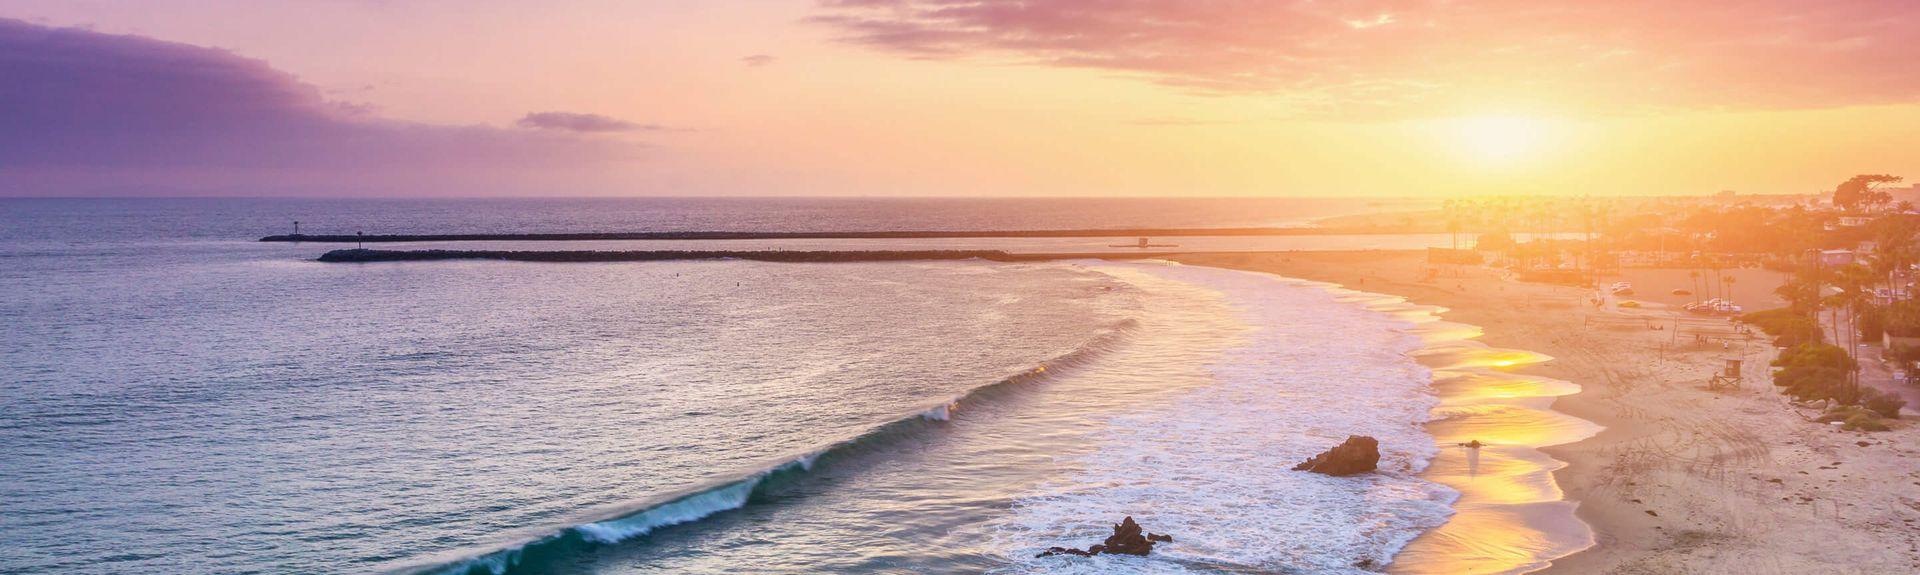 Aliso Beach Park, Laguna Beach, California, United States of America